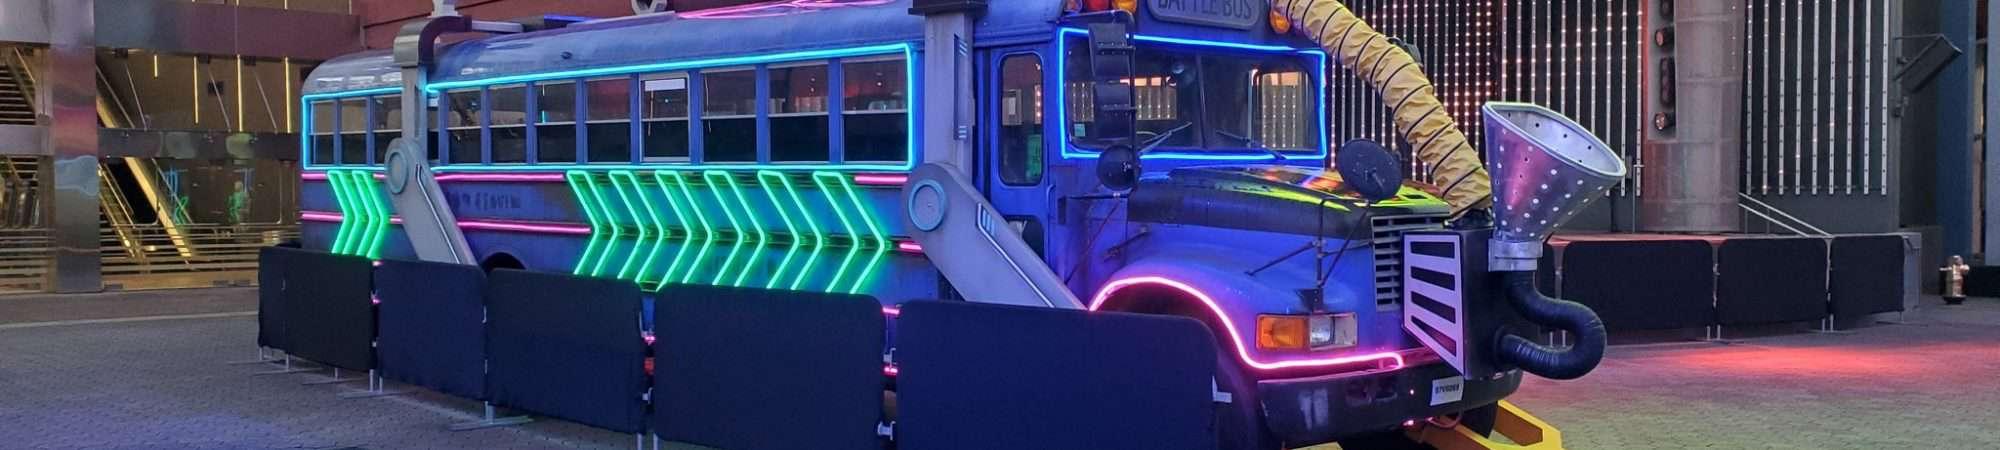 ônibus de batalha fortnite